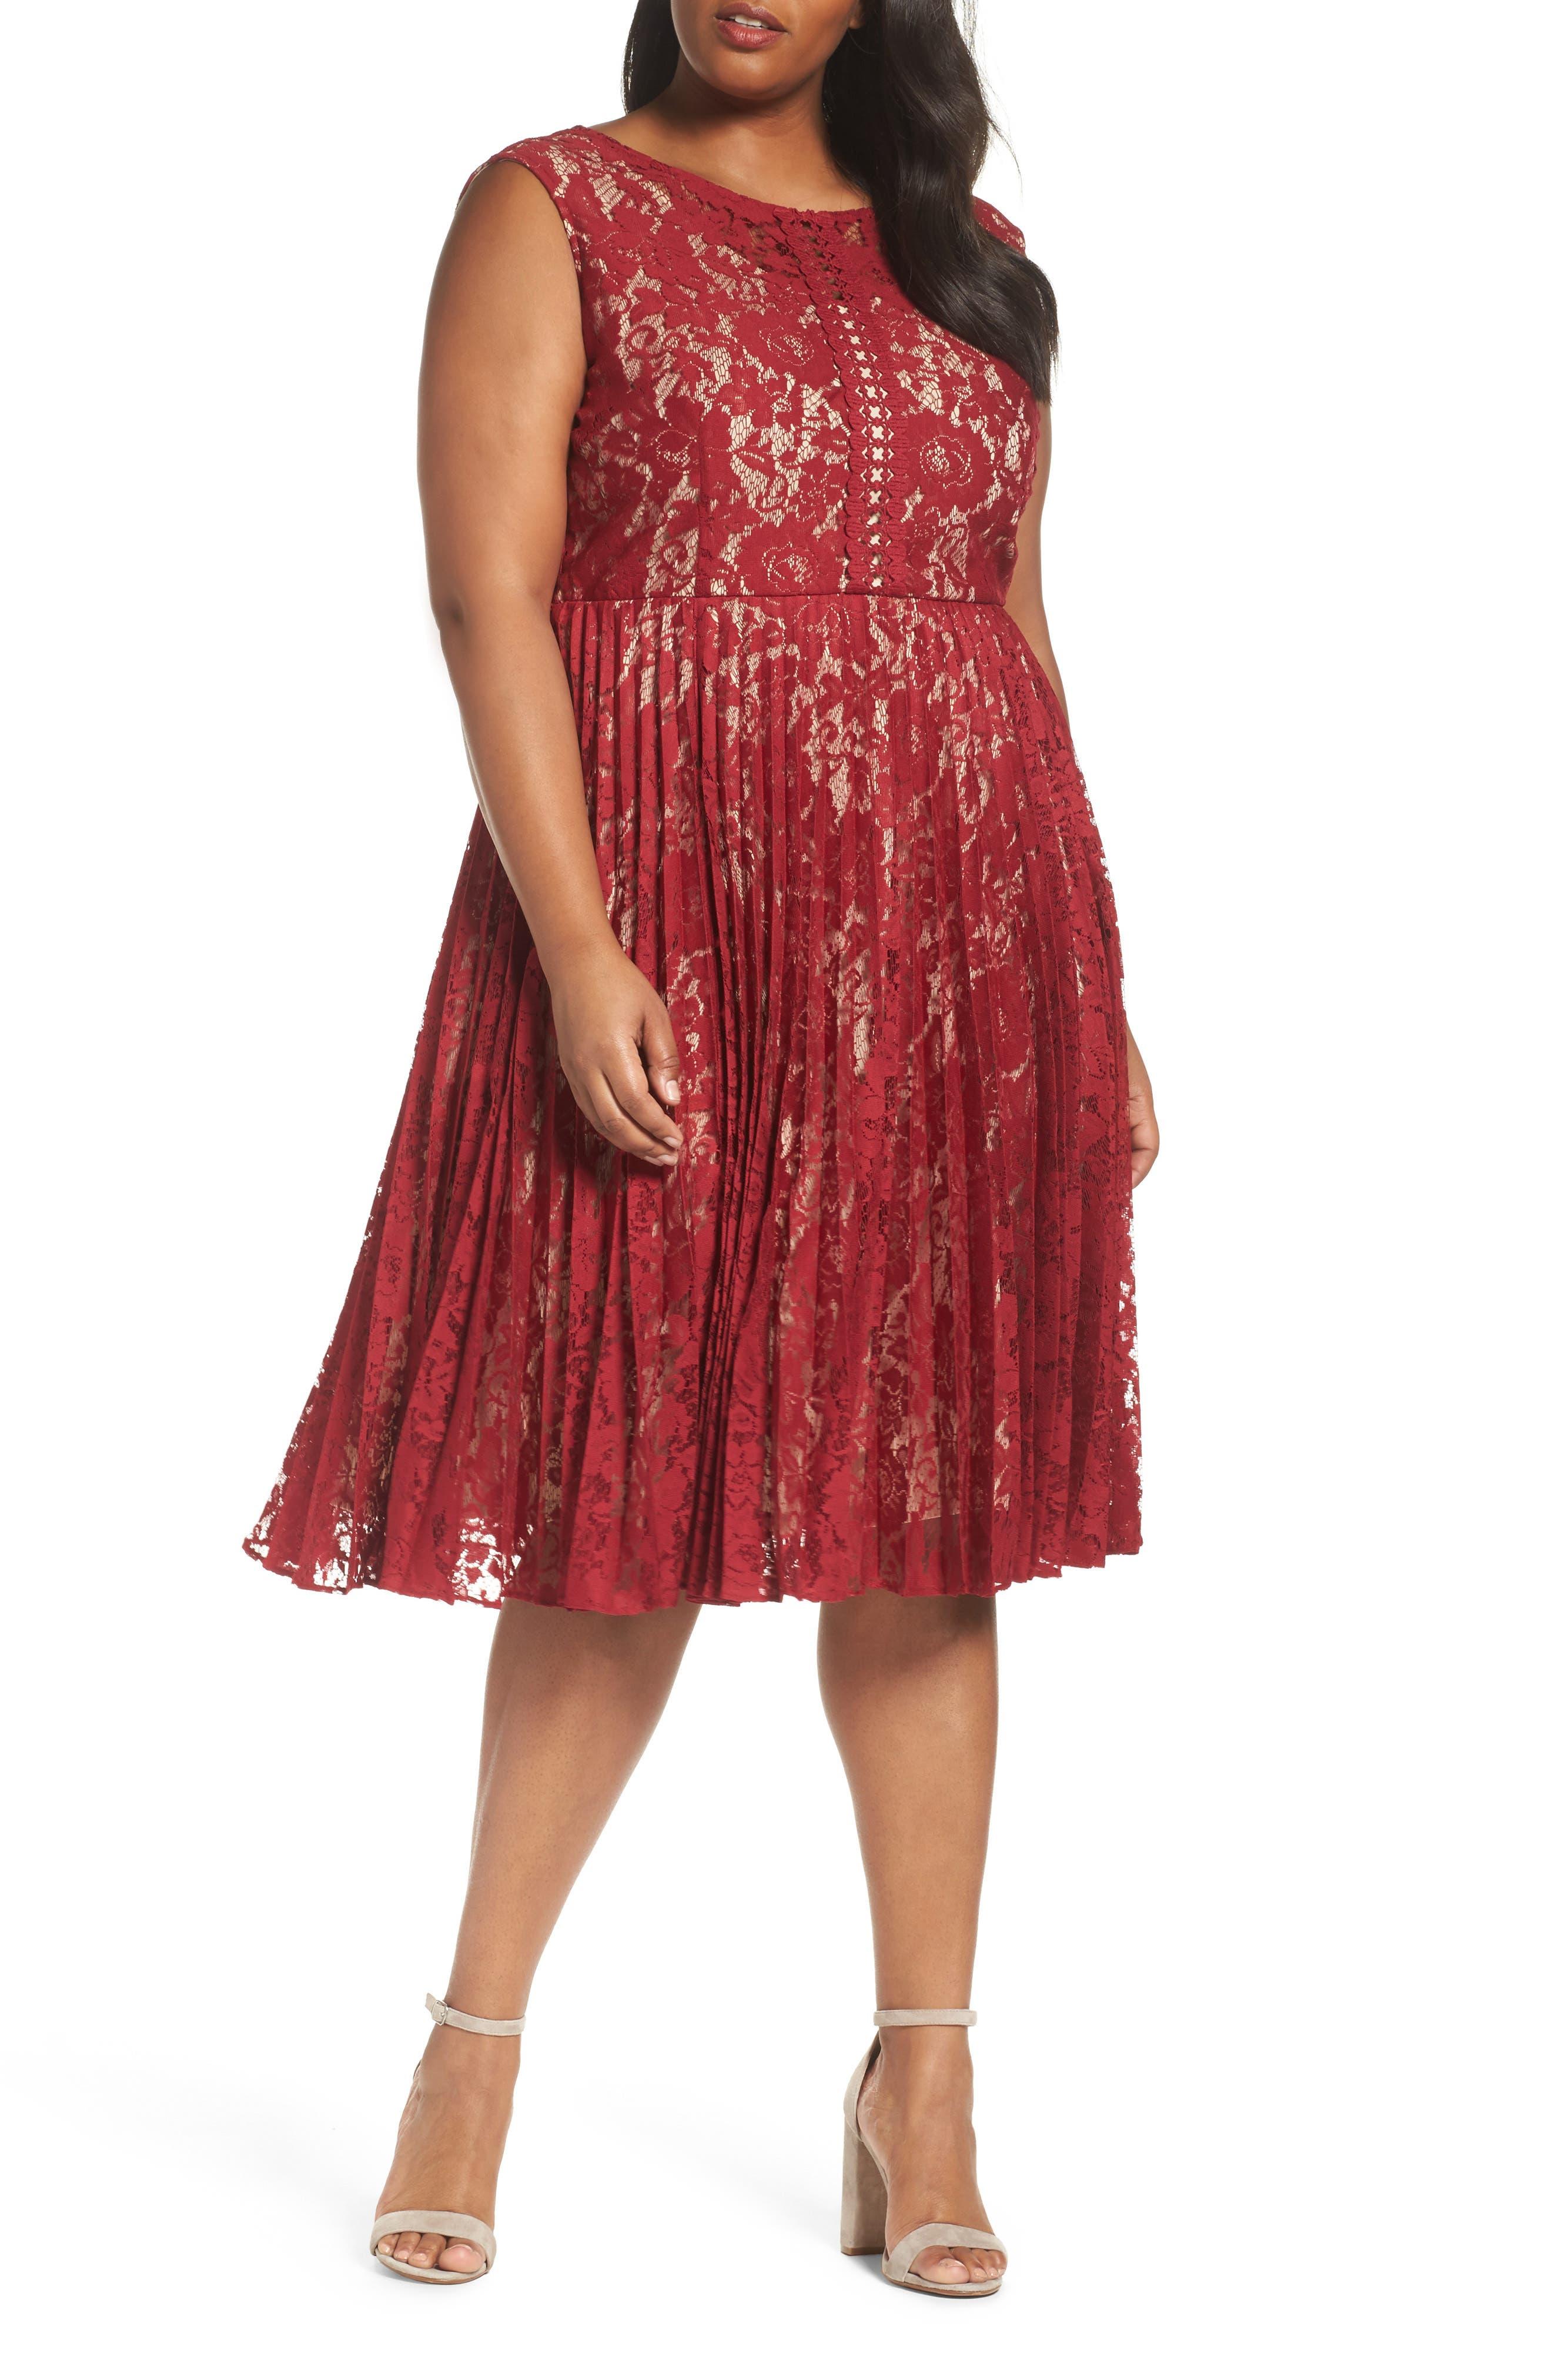 Alternate Image 1 Selected - Gabby Skye Illusion Lace Pleat Midi Dress (Plus Size)